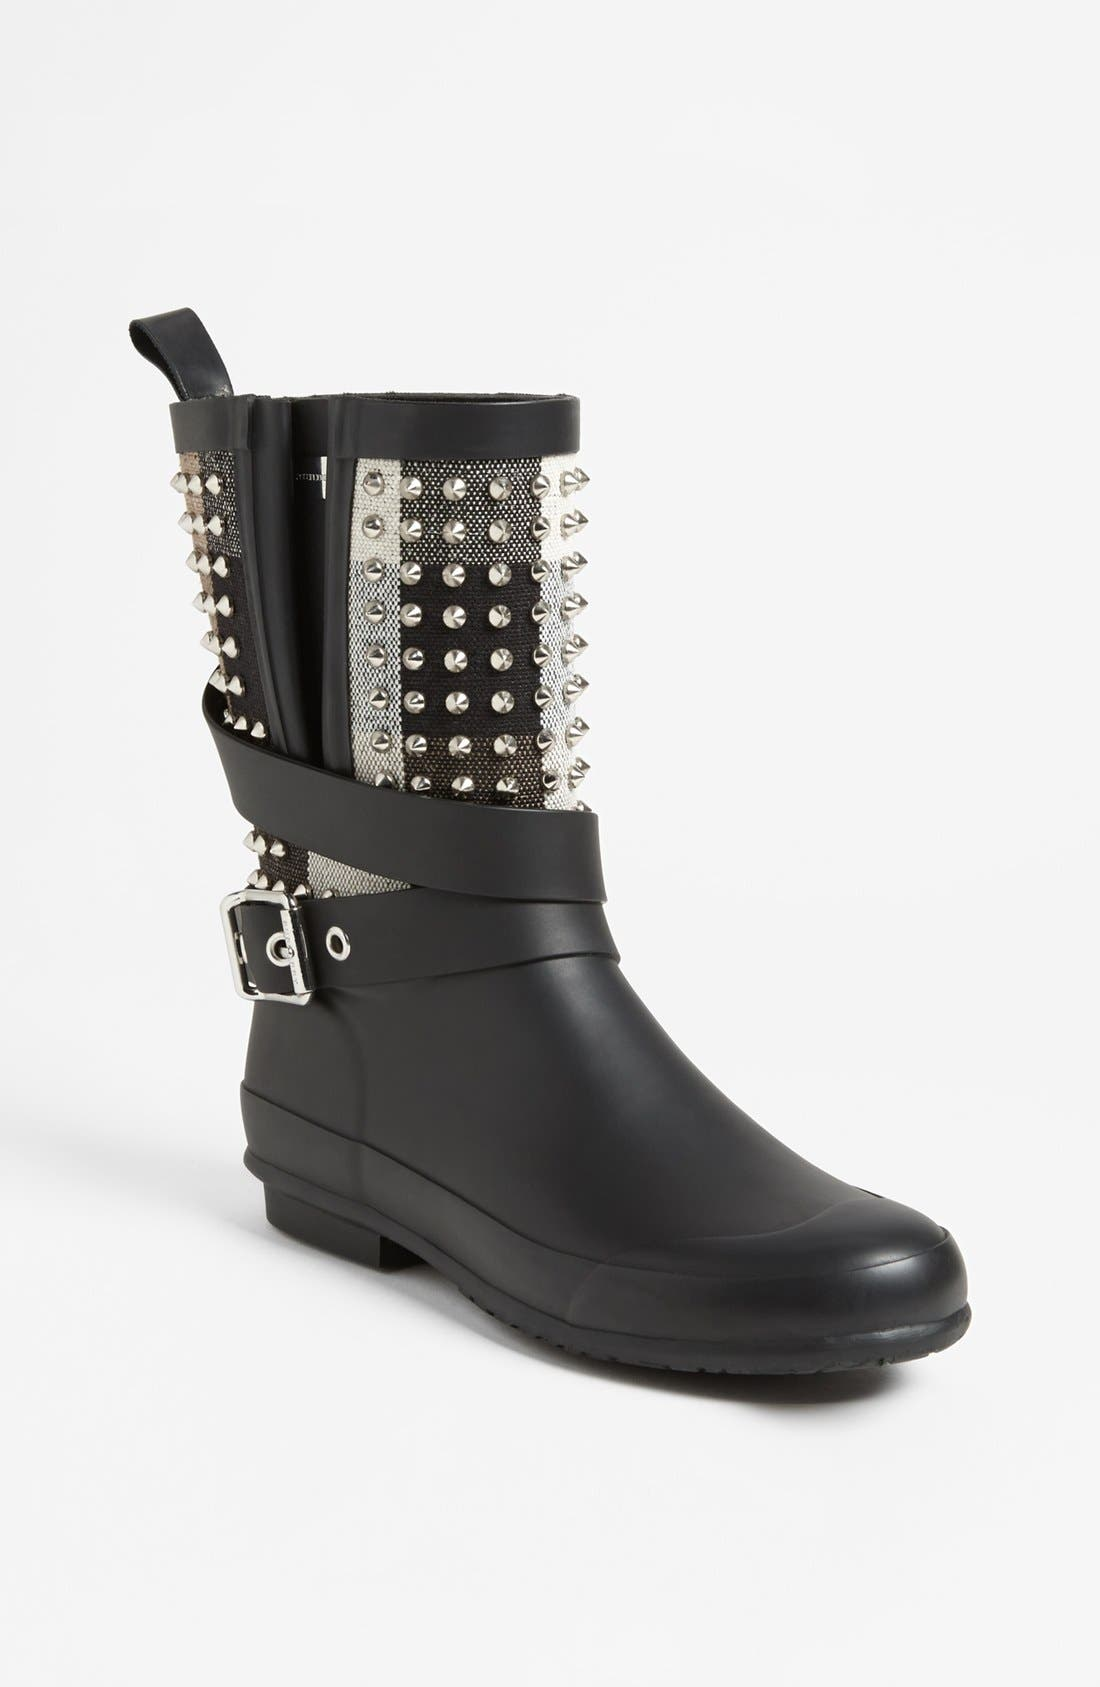 Alternate Image 1 Selected - Burberry 'Holloway' Rain Boot (Women)